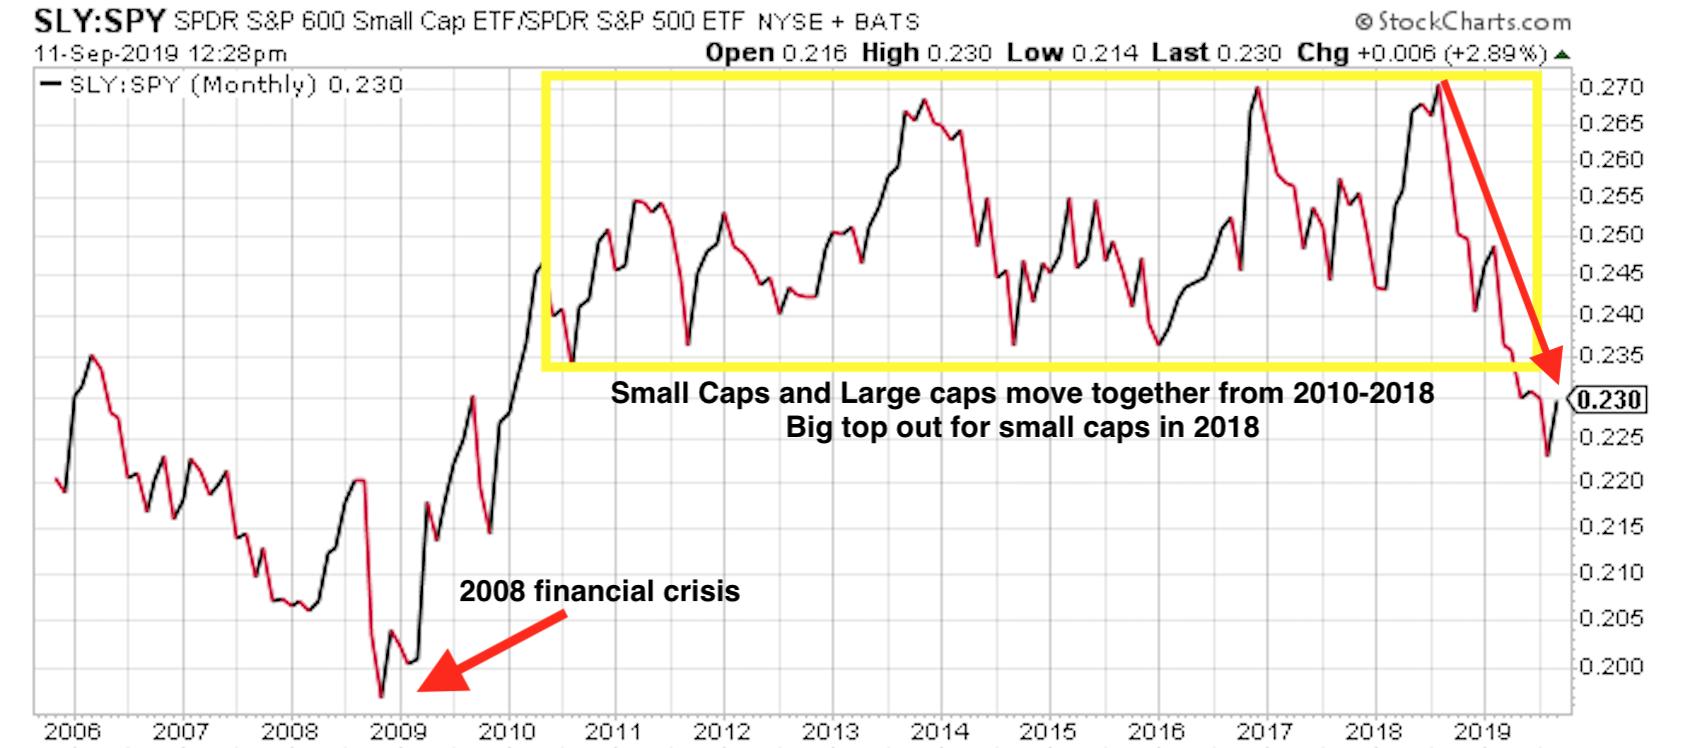 Small cap ETFs vs large cap over the last 13 years